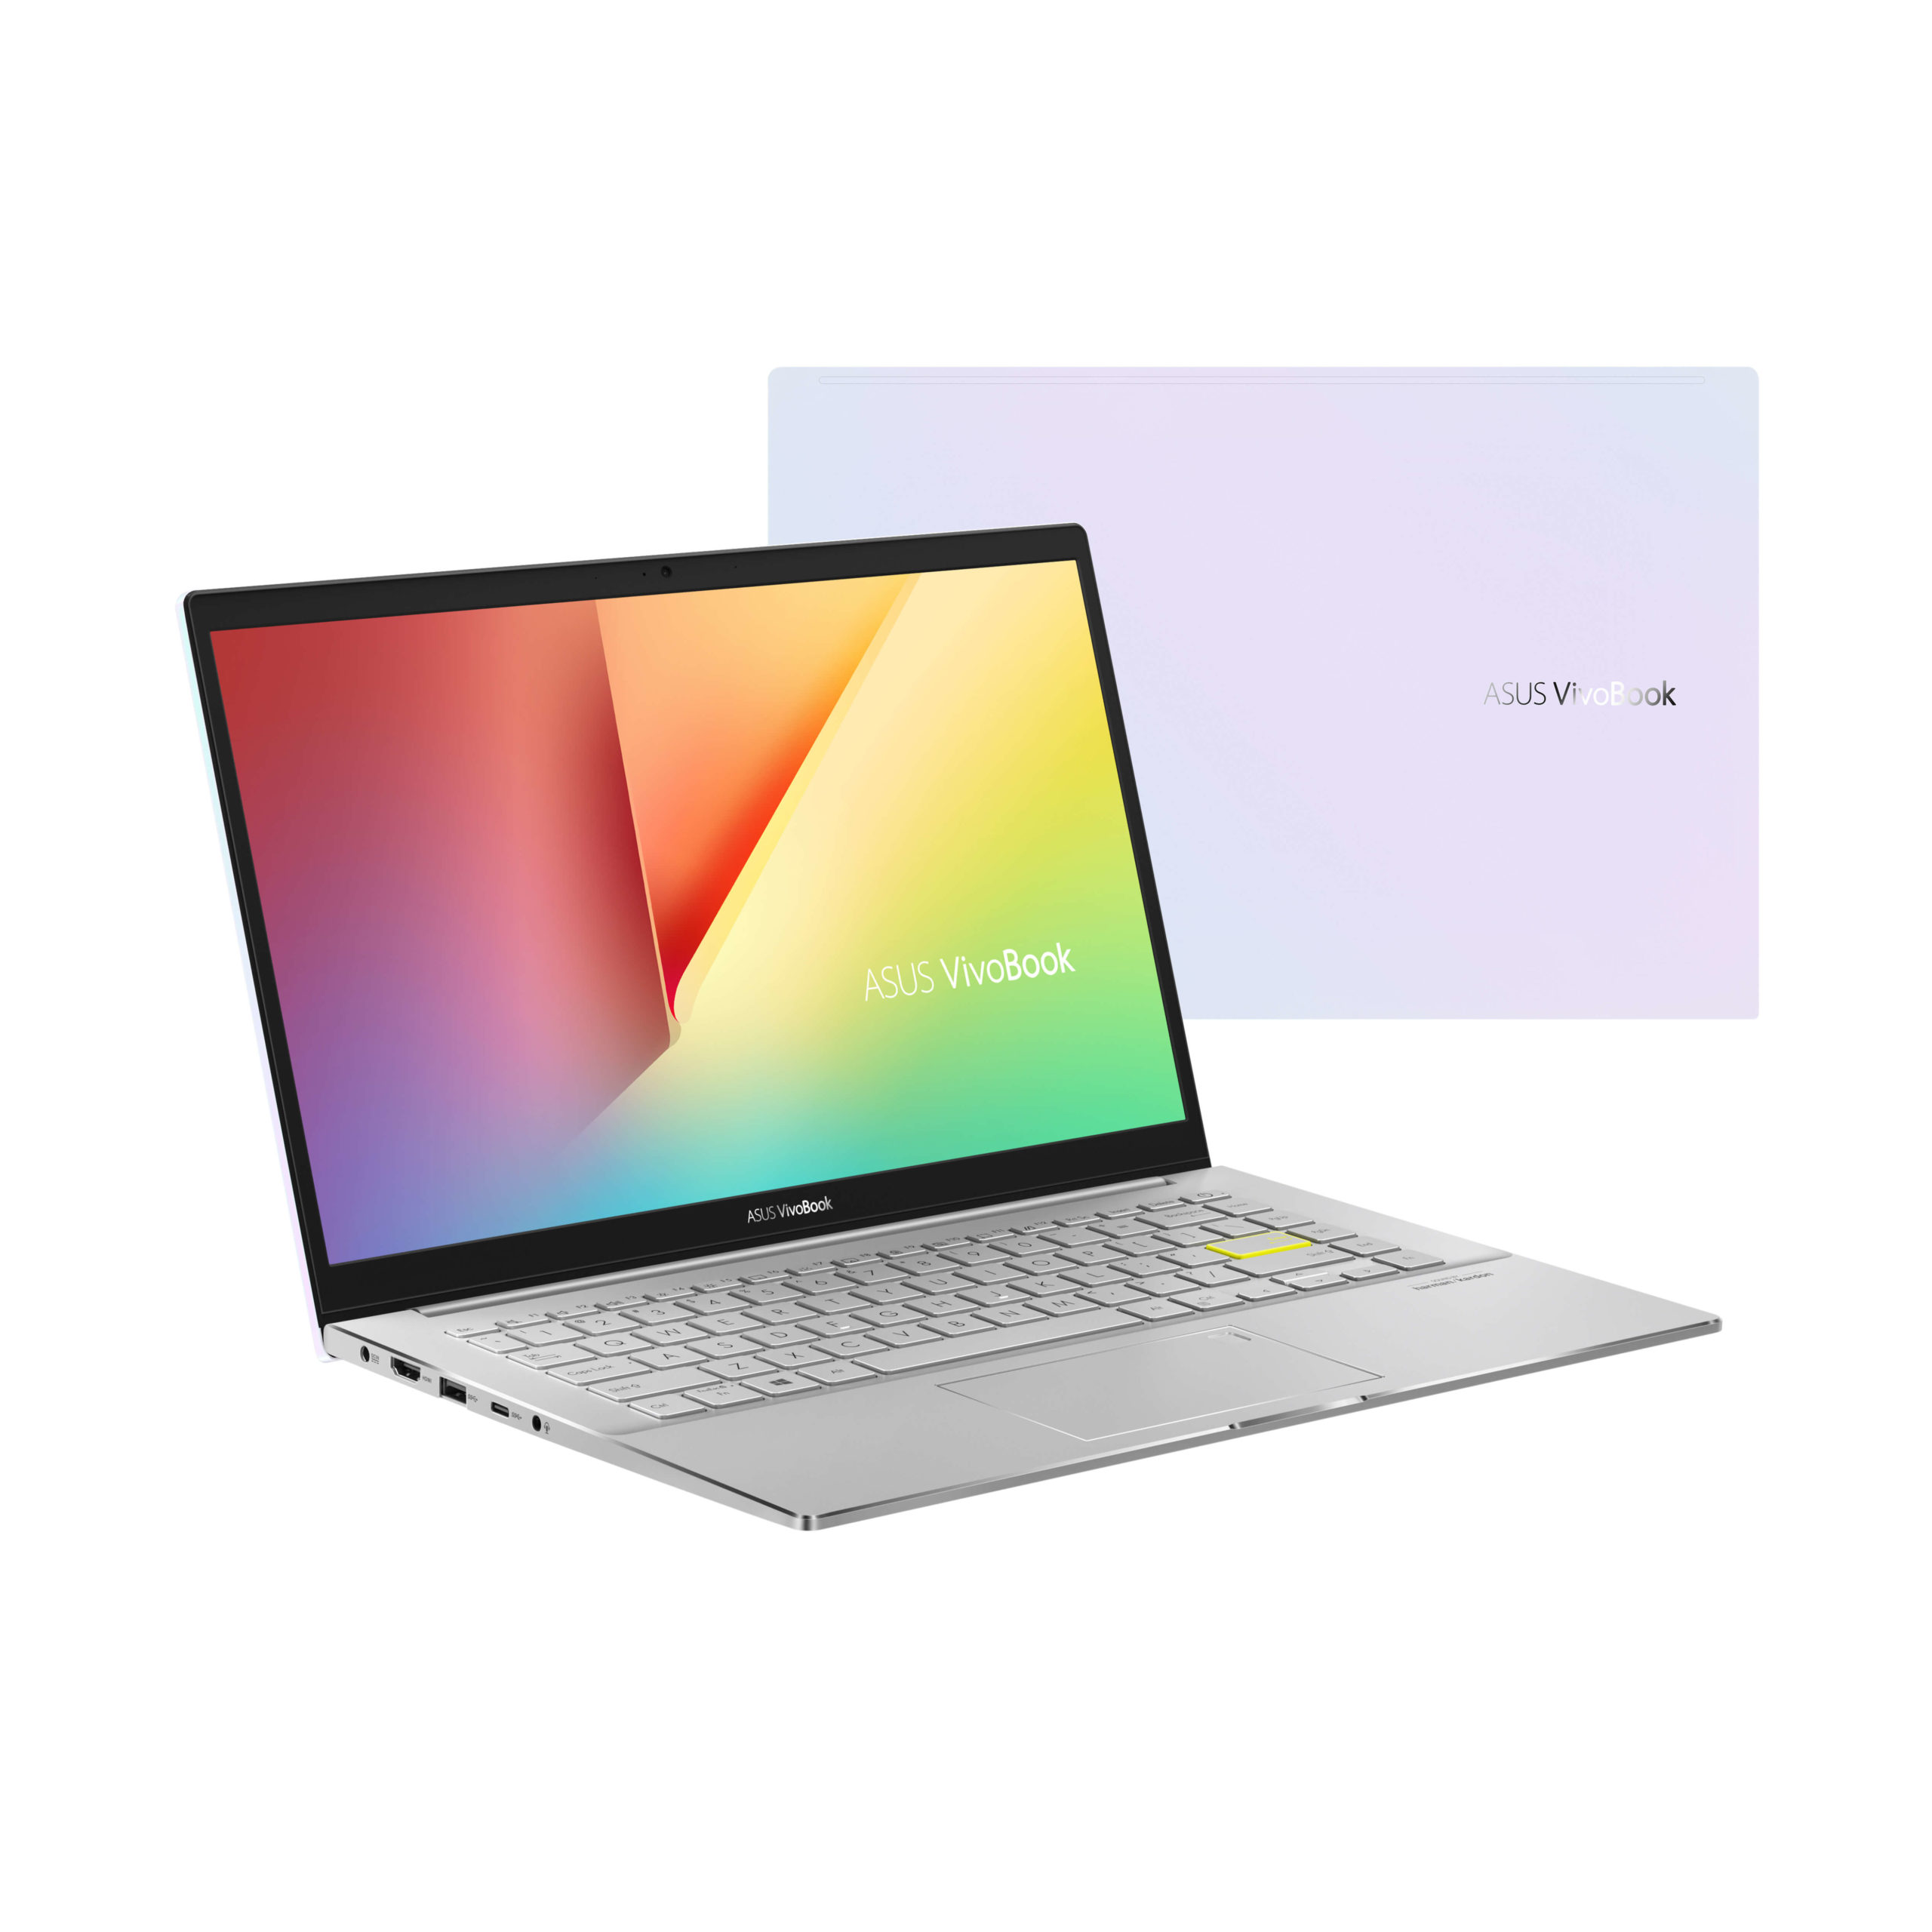 Laptop Stylish ASUS VivoBook Kini Tampil Semakin Powerful